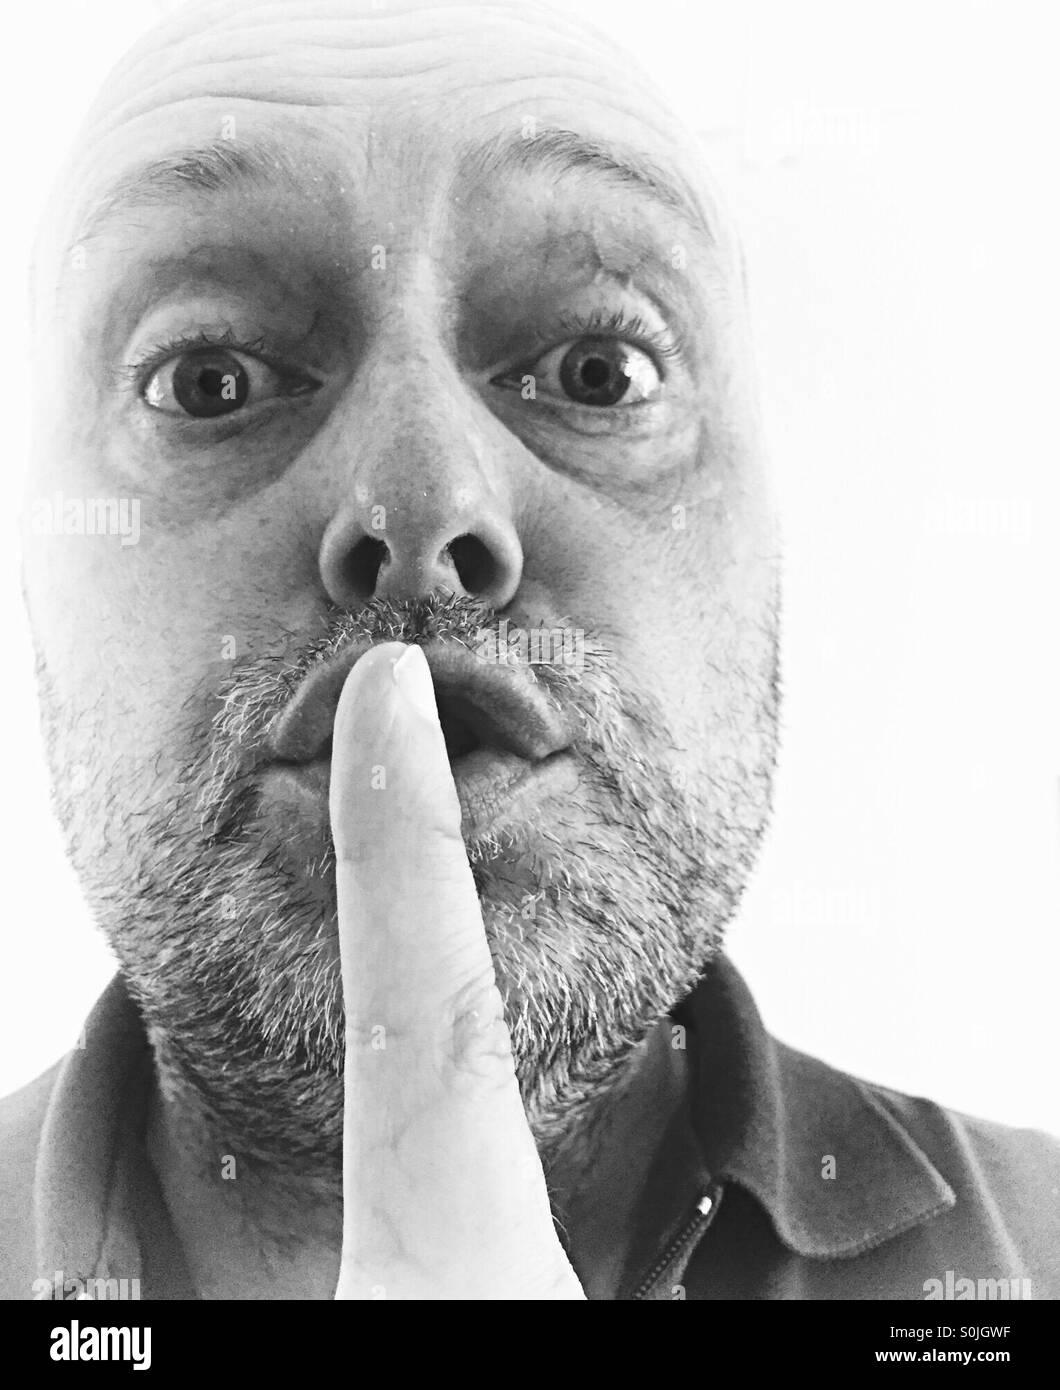 Hush! - Stock Image